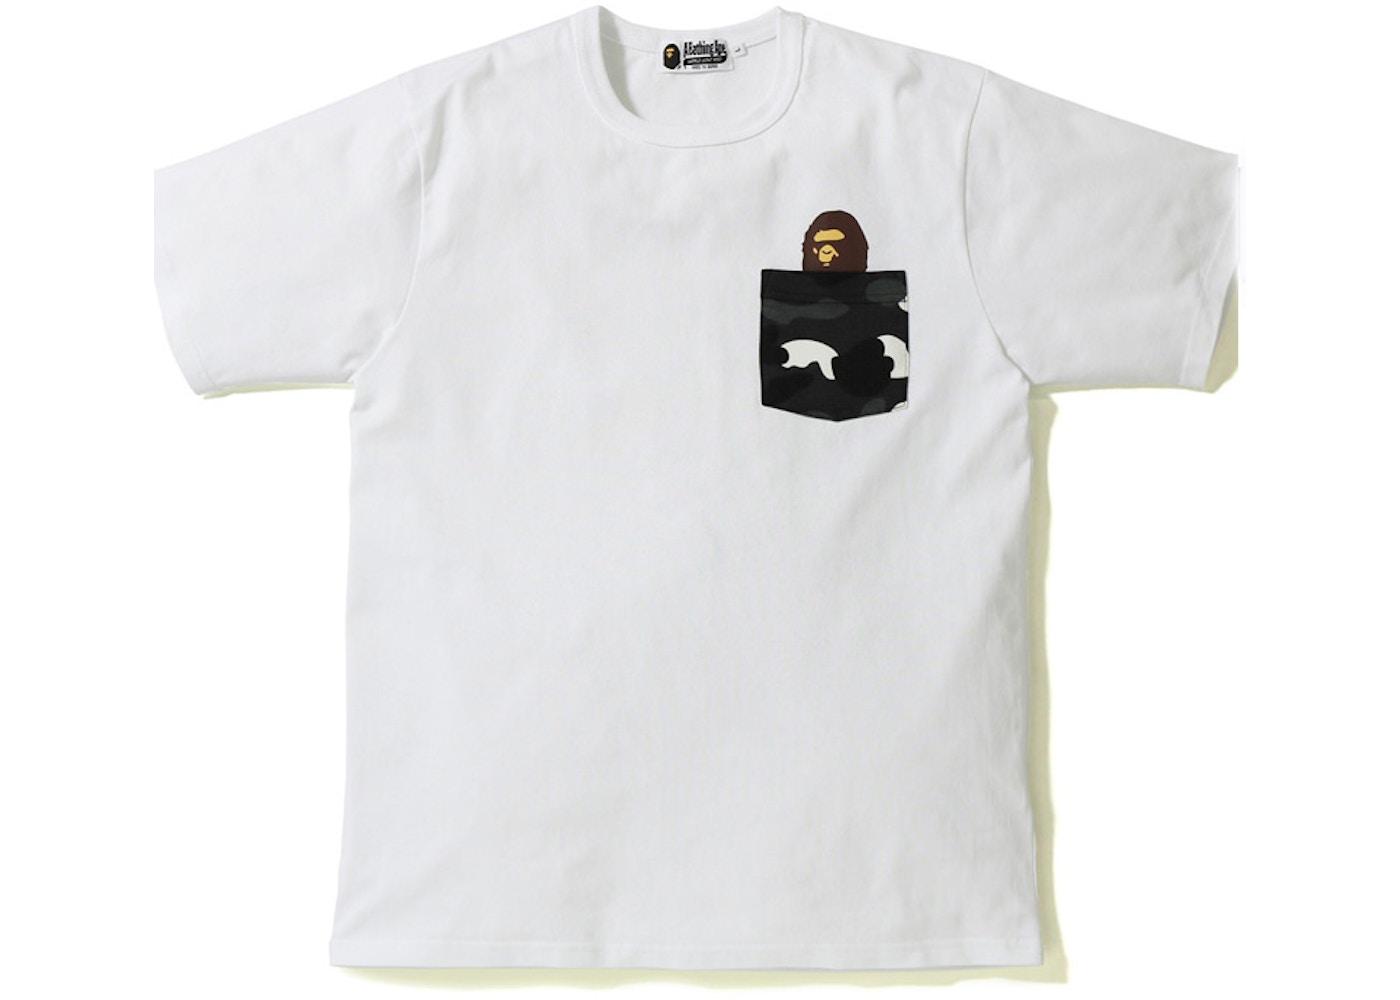 e343de70d Sell. or Ask. Size --. View All Bids. BAPE City Camo Pocket Tee White